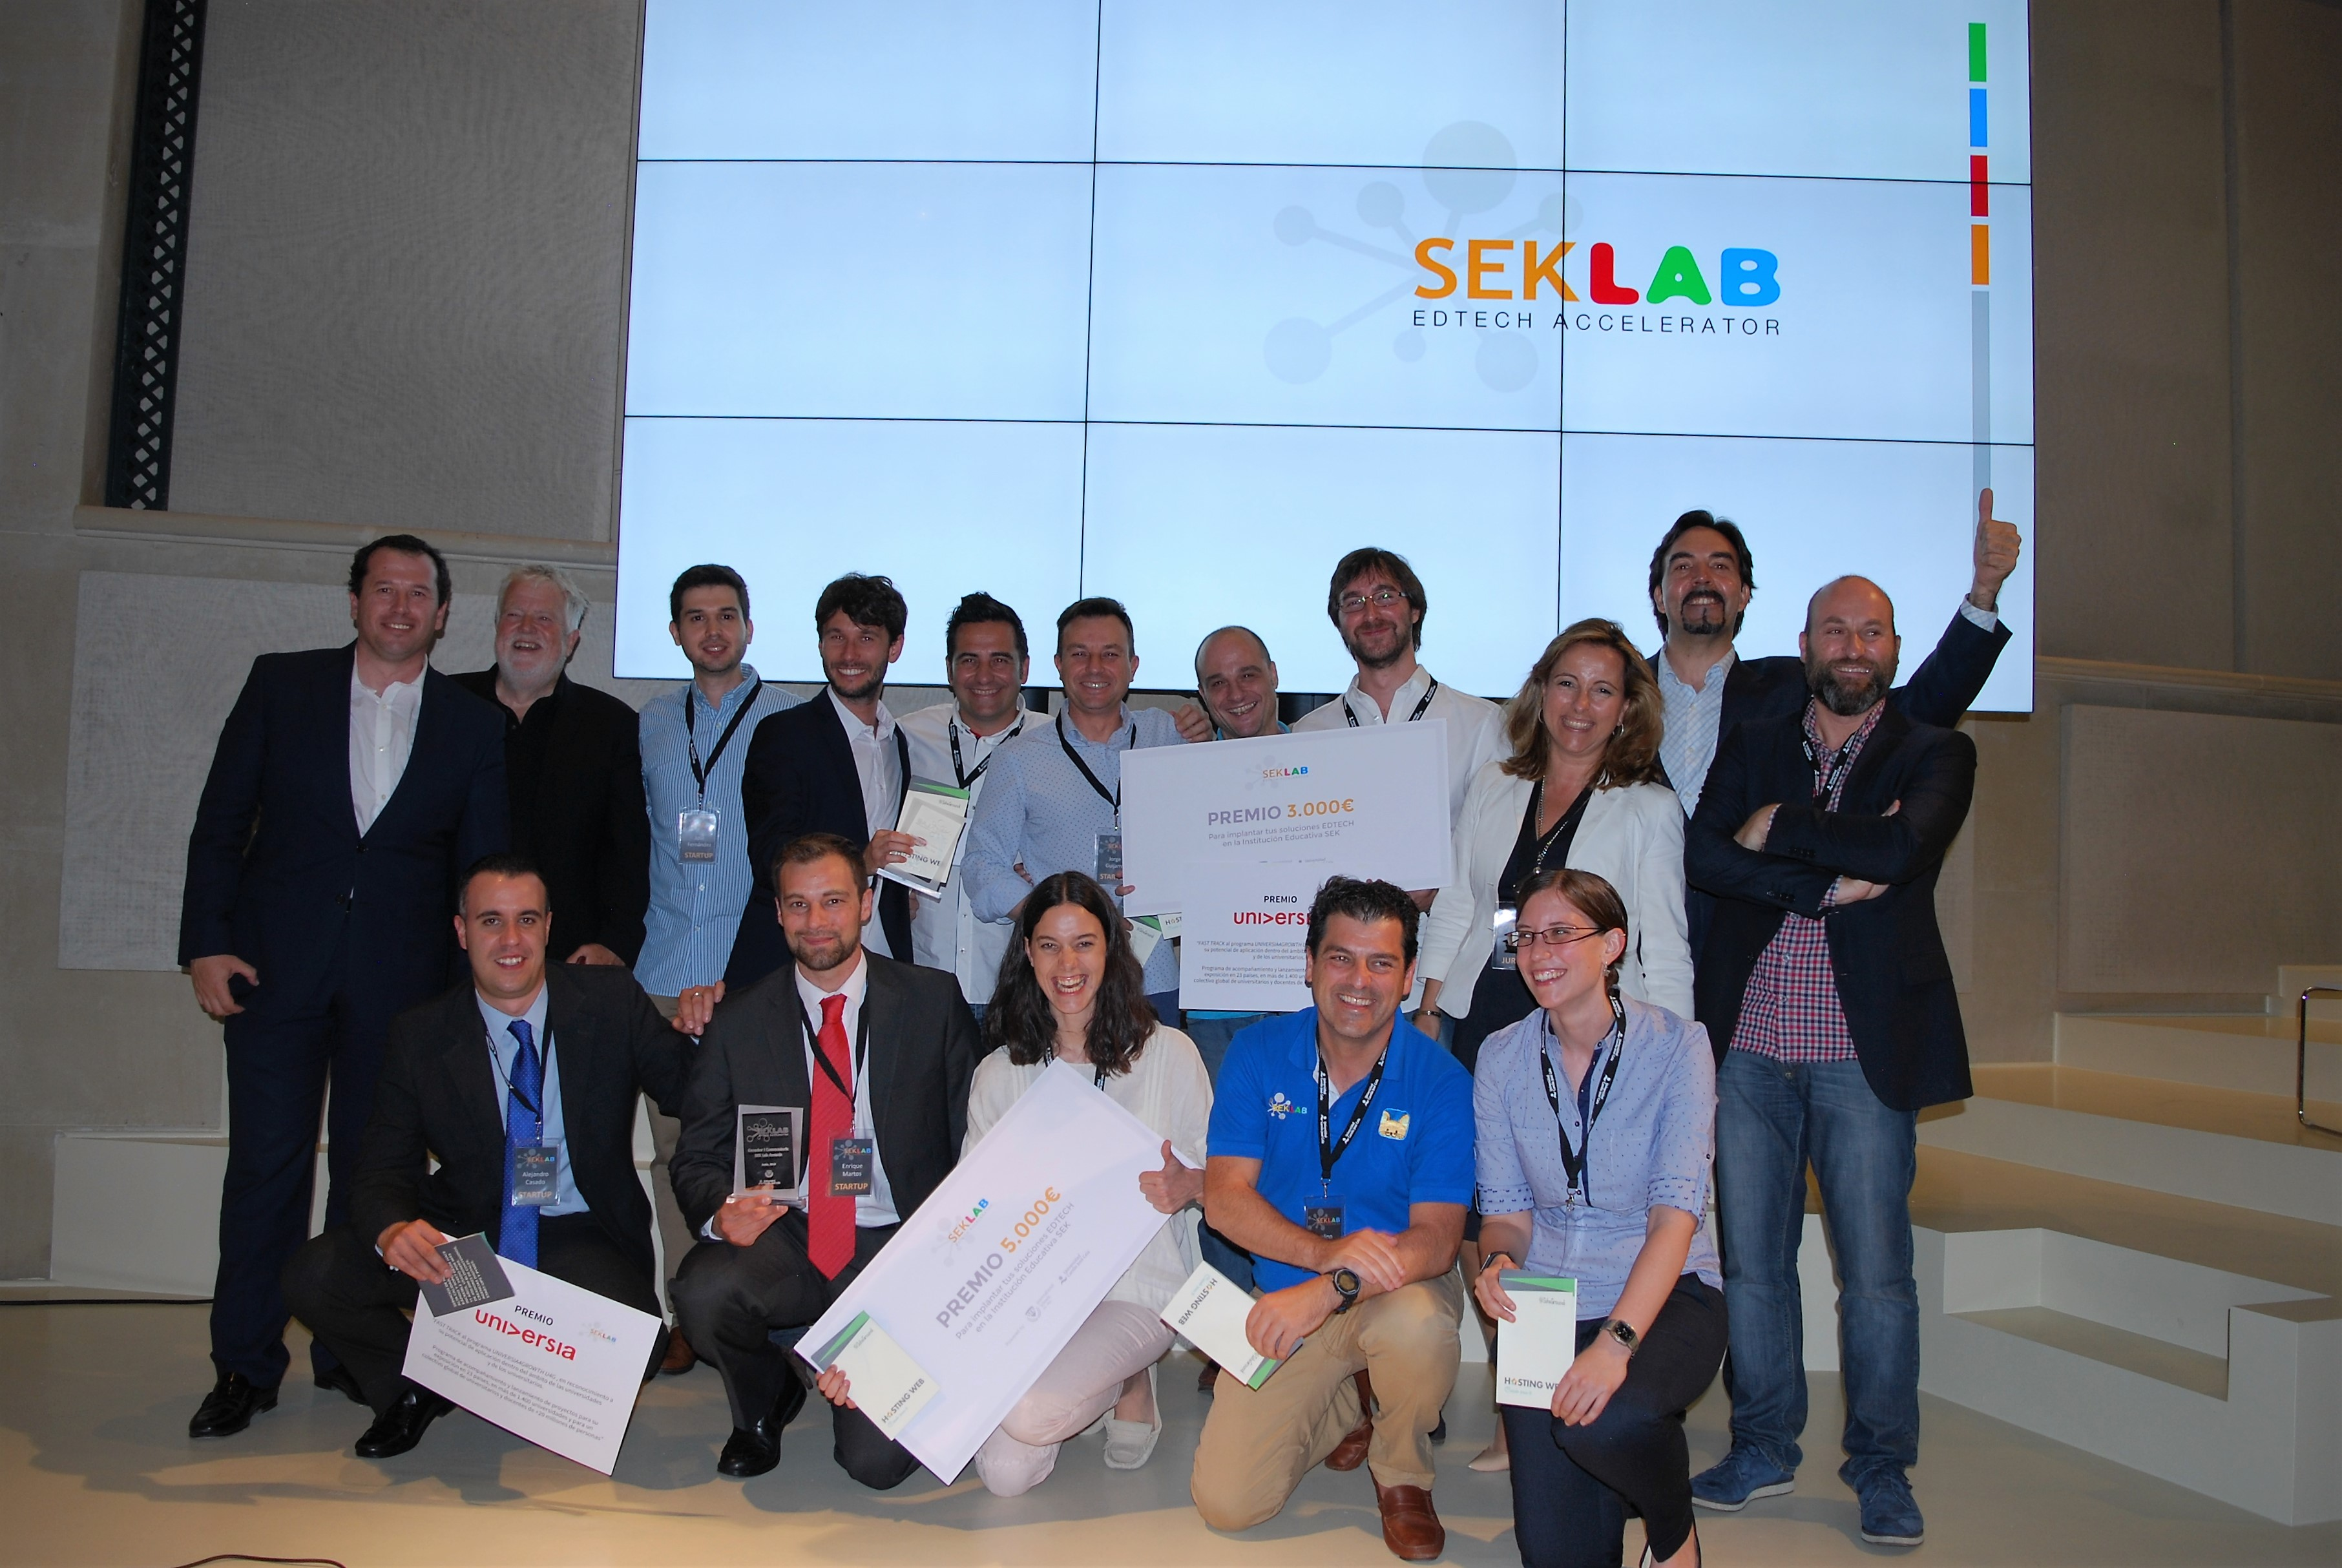 SEK Labers premio Siteground